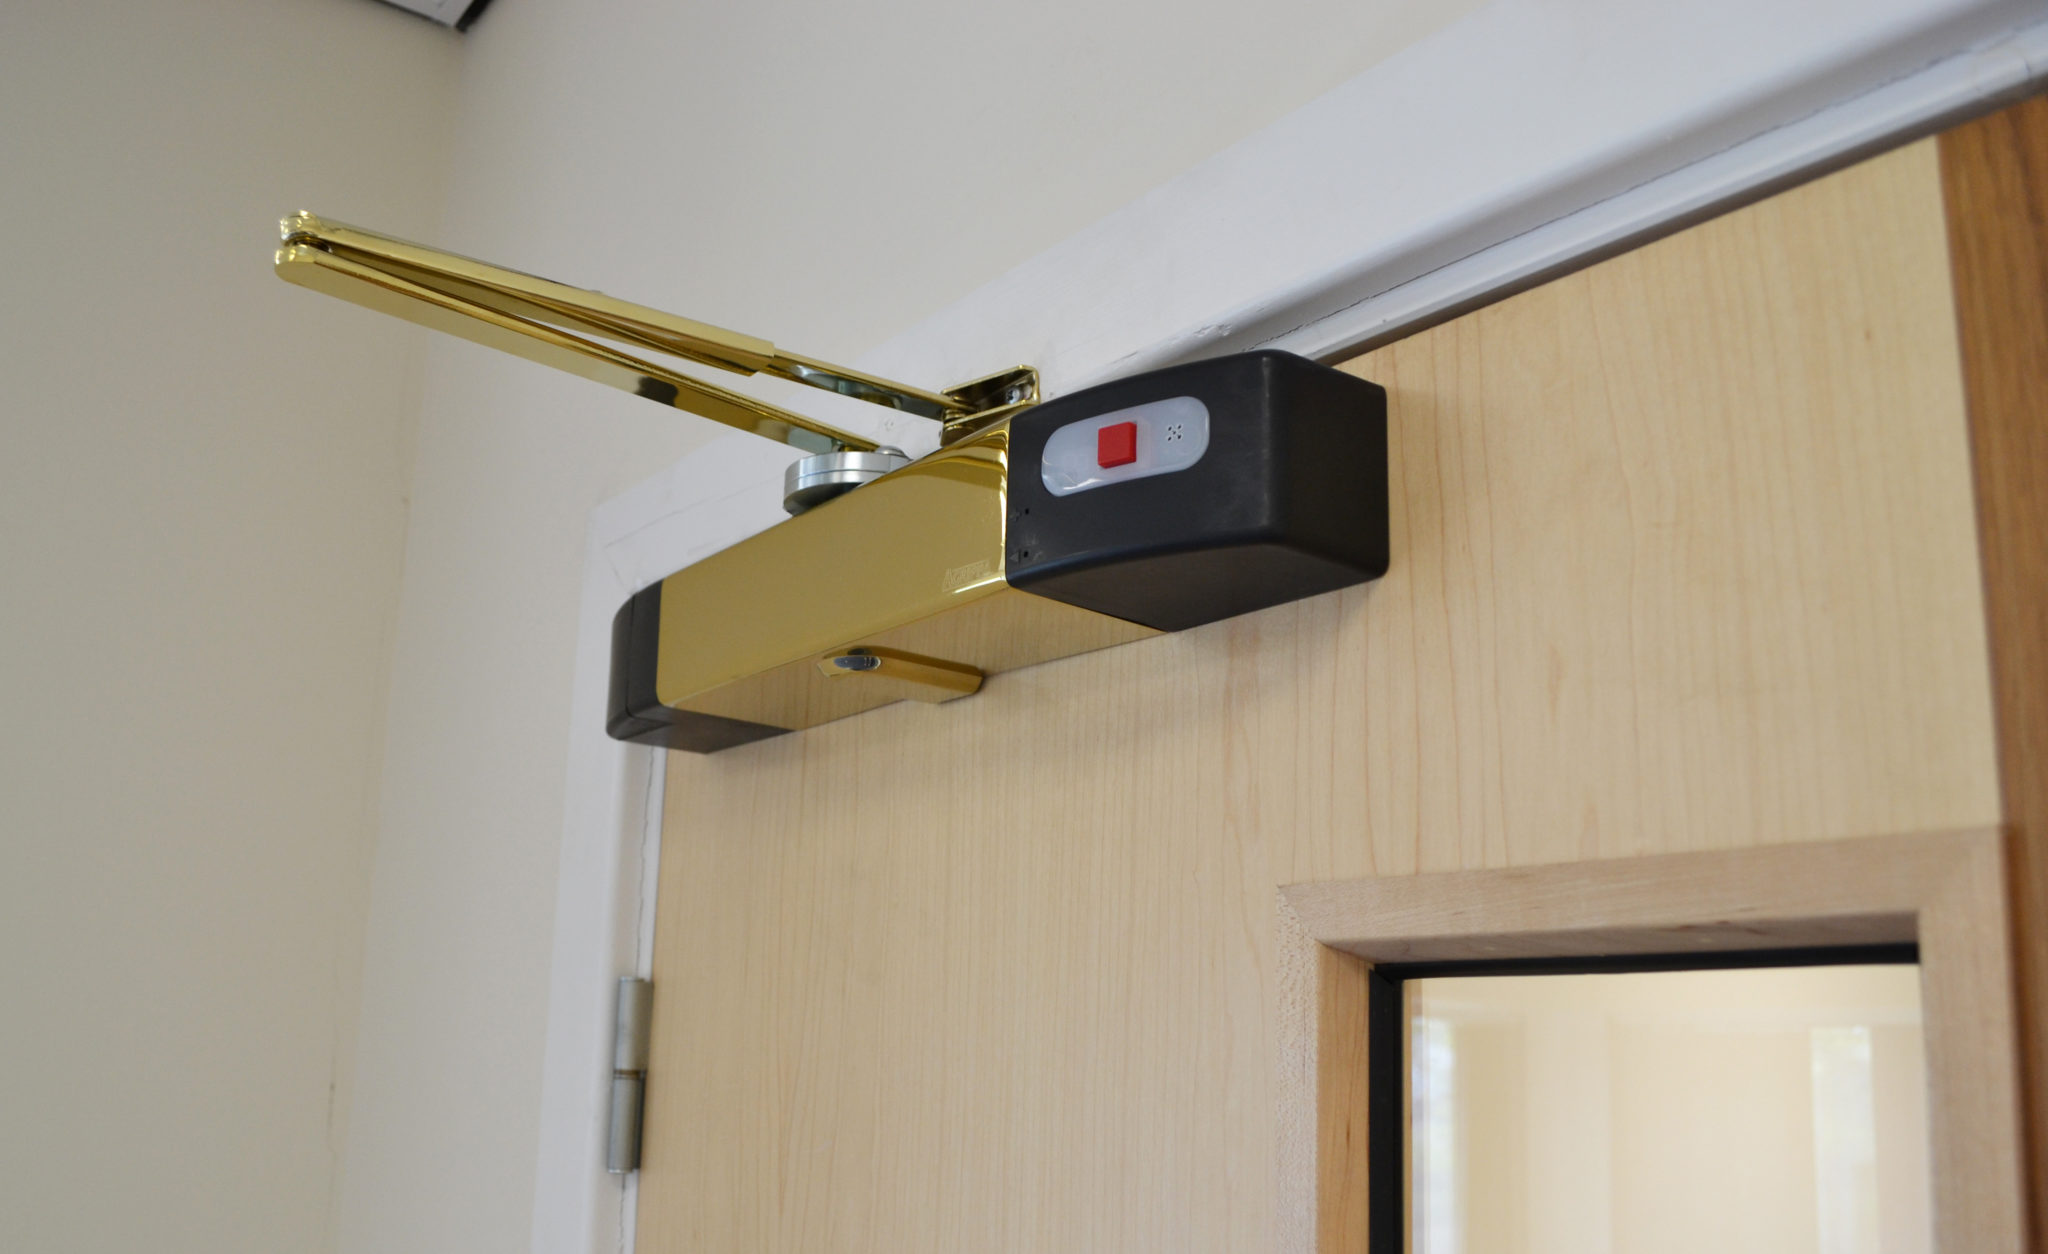 agrippa fire door closer for sale from fire door safety shop. Black Bedroom Furniture Sets. Home Design Ideas